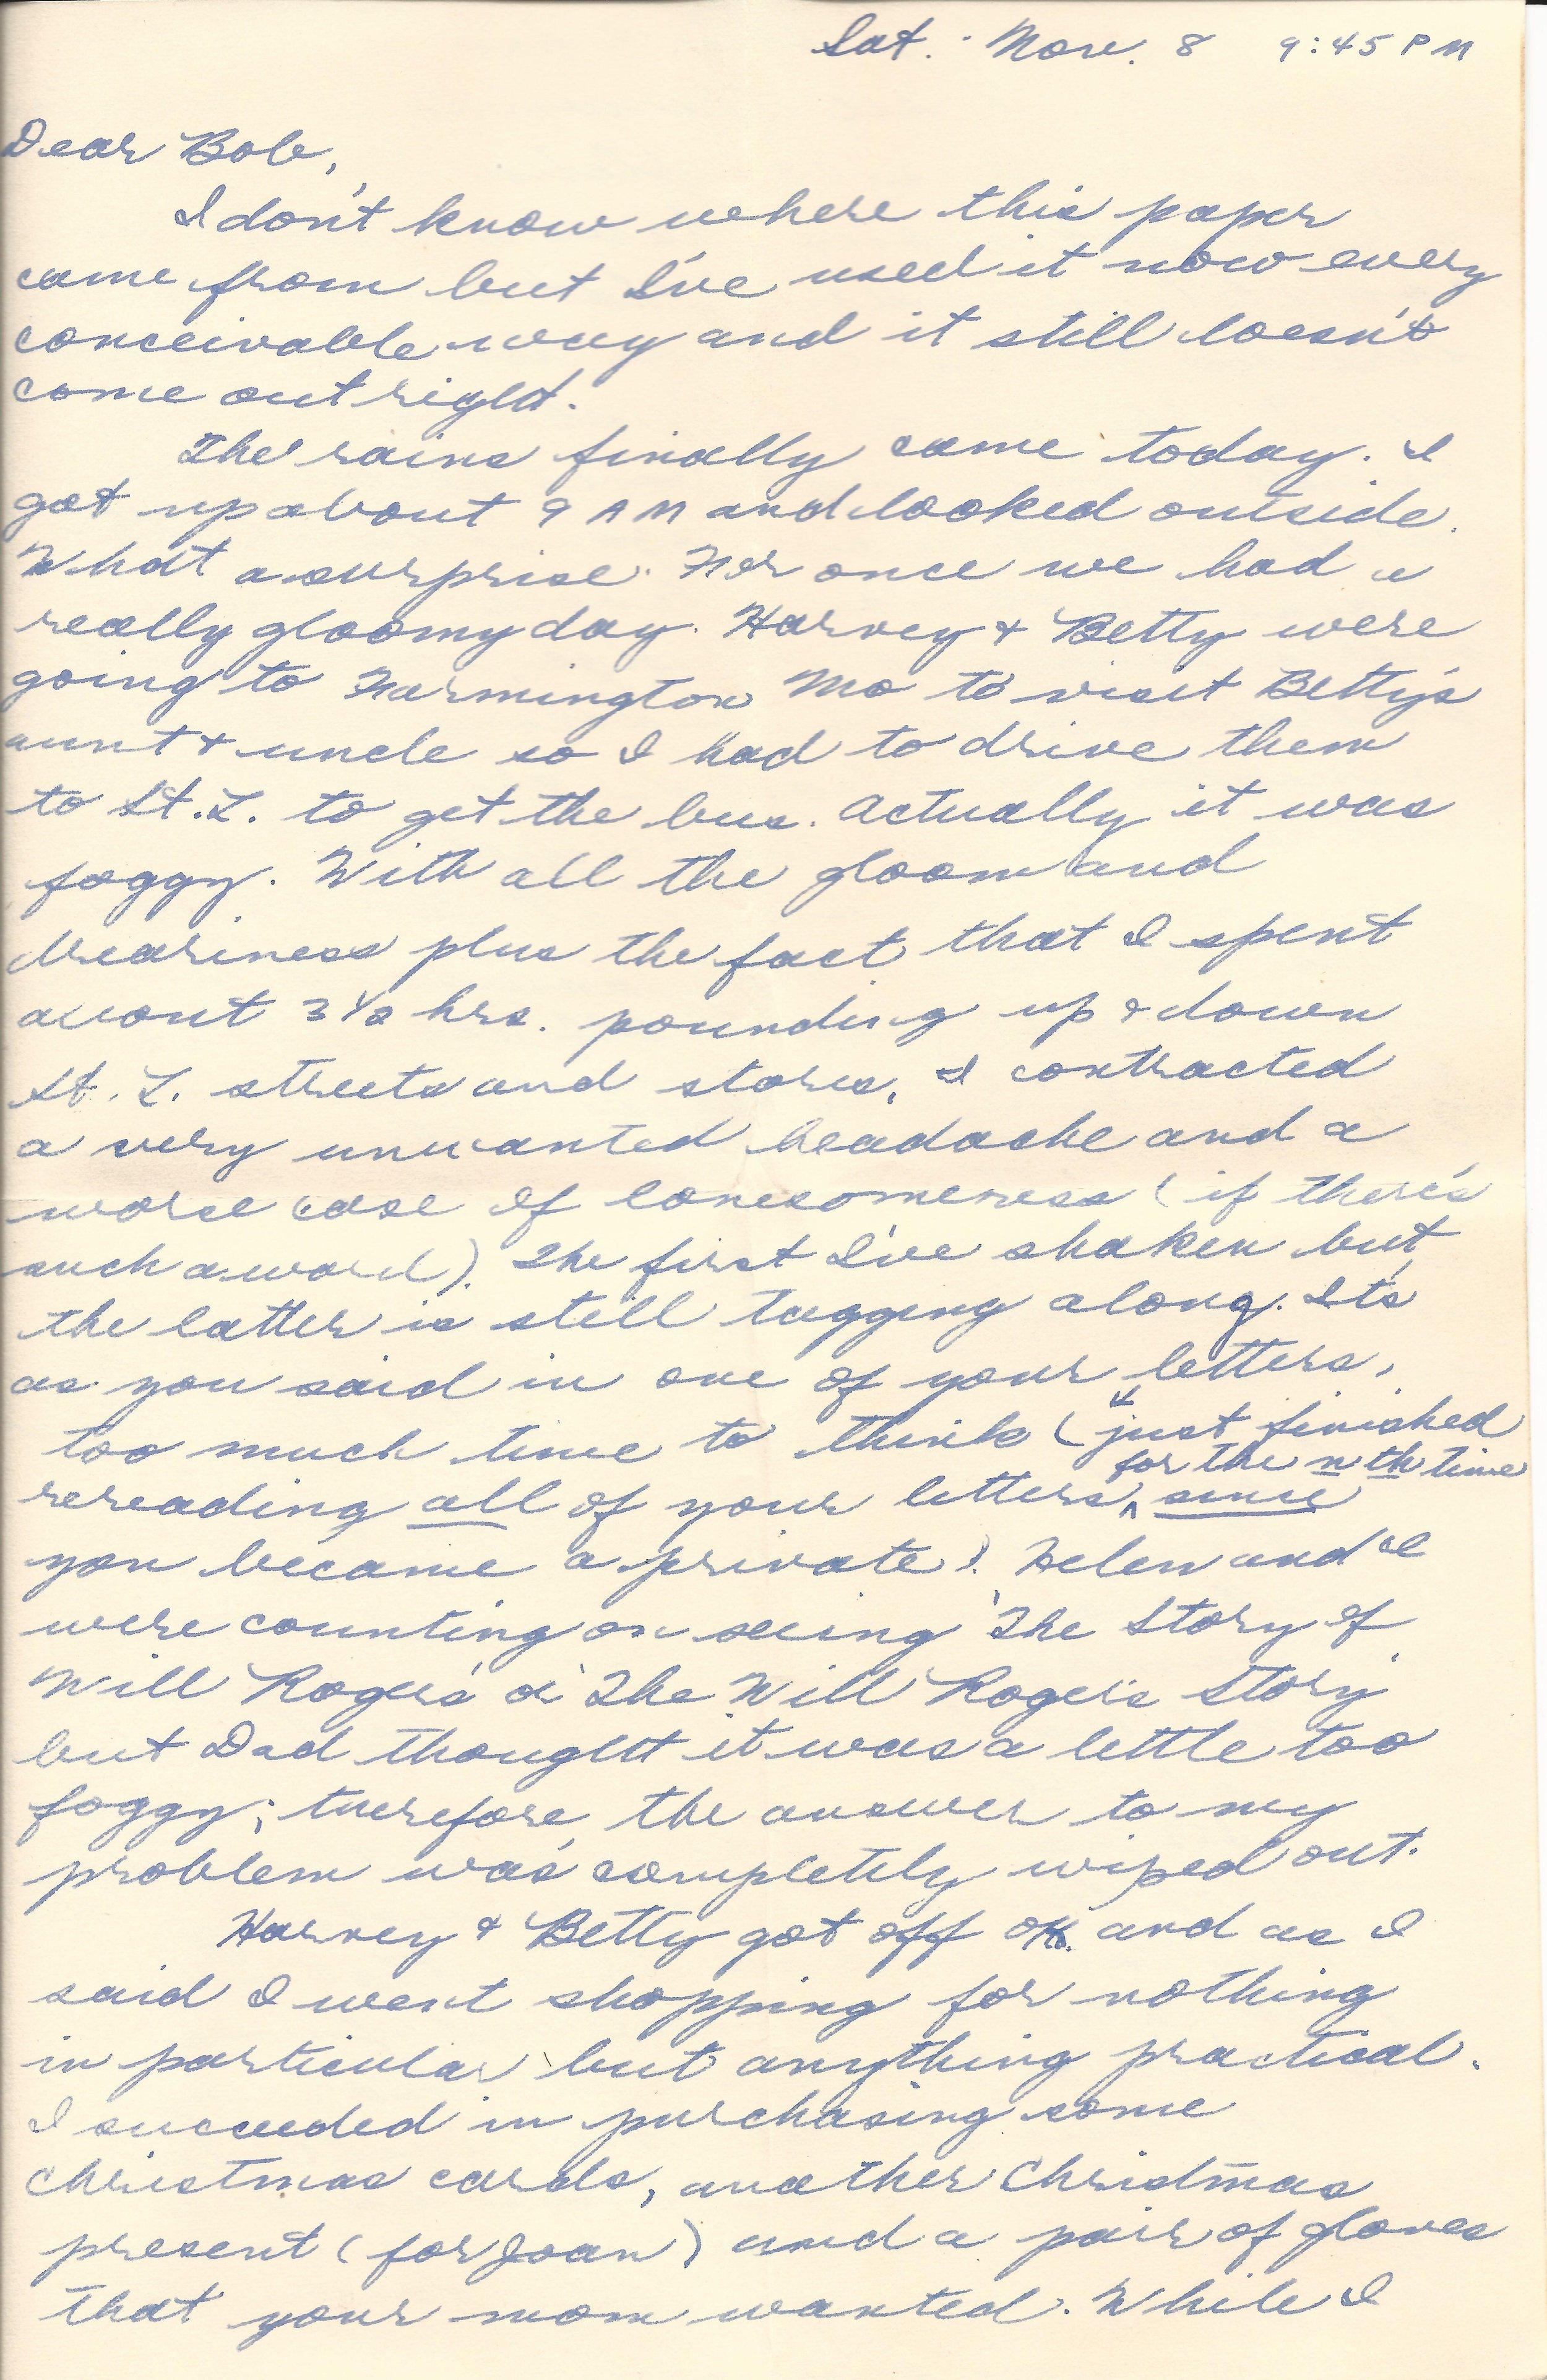 5. Nov. 8, 1952 (Oma)_Page_2.jpg